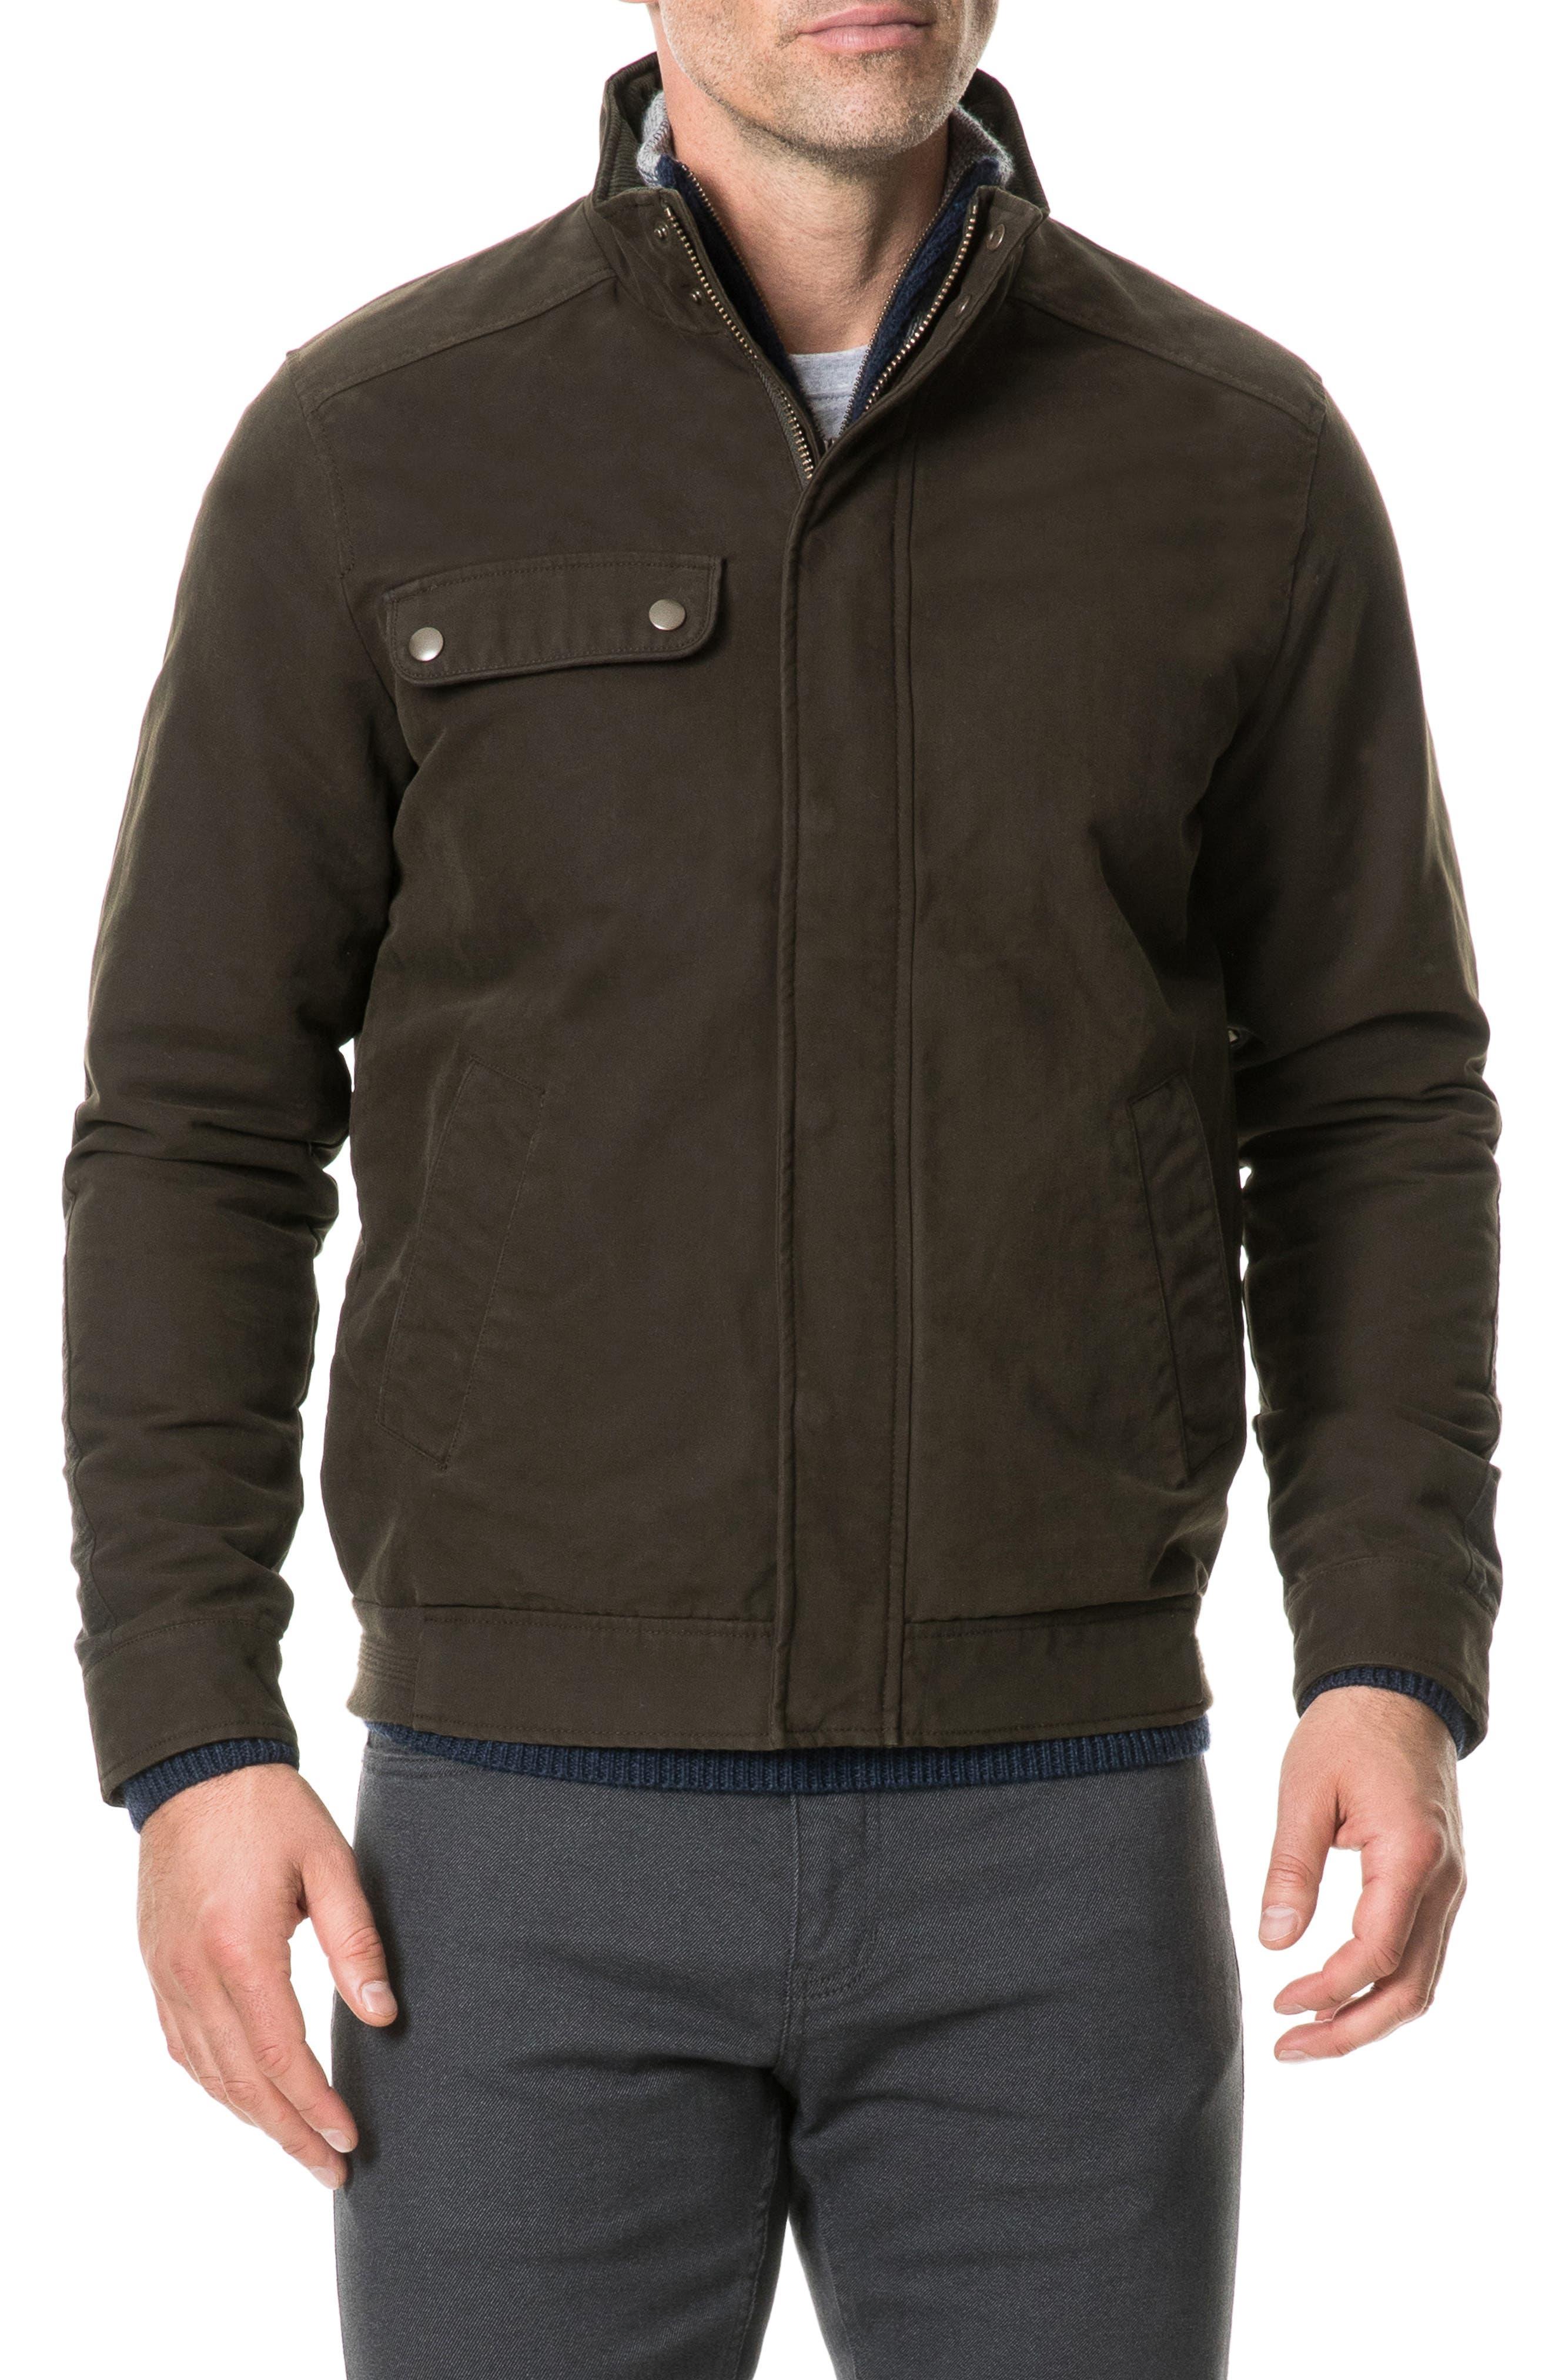 Eskdale Regular Fit Waterproof Bomber Jacket,                             Main thumbnail 1, color,                             TOBACCO